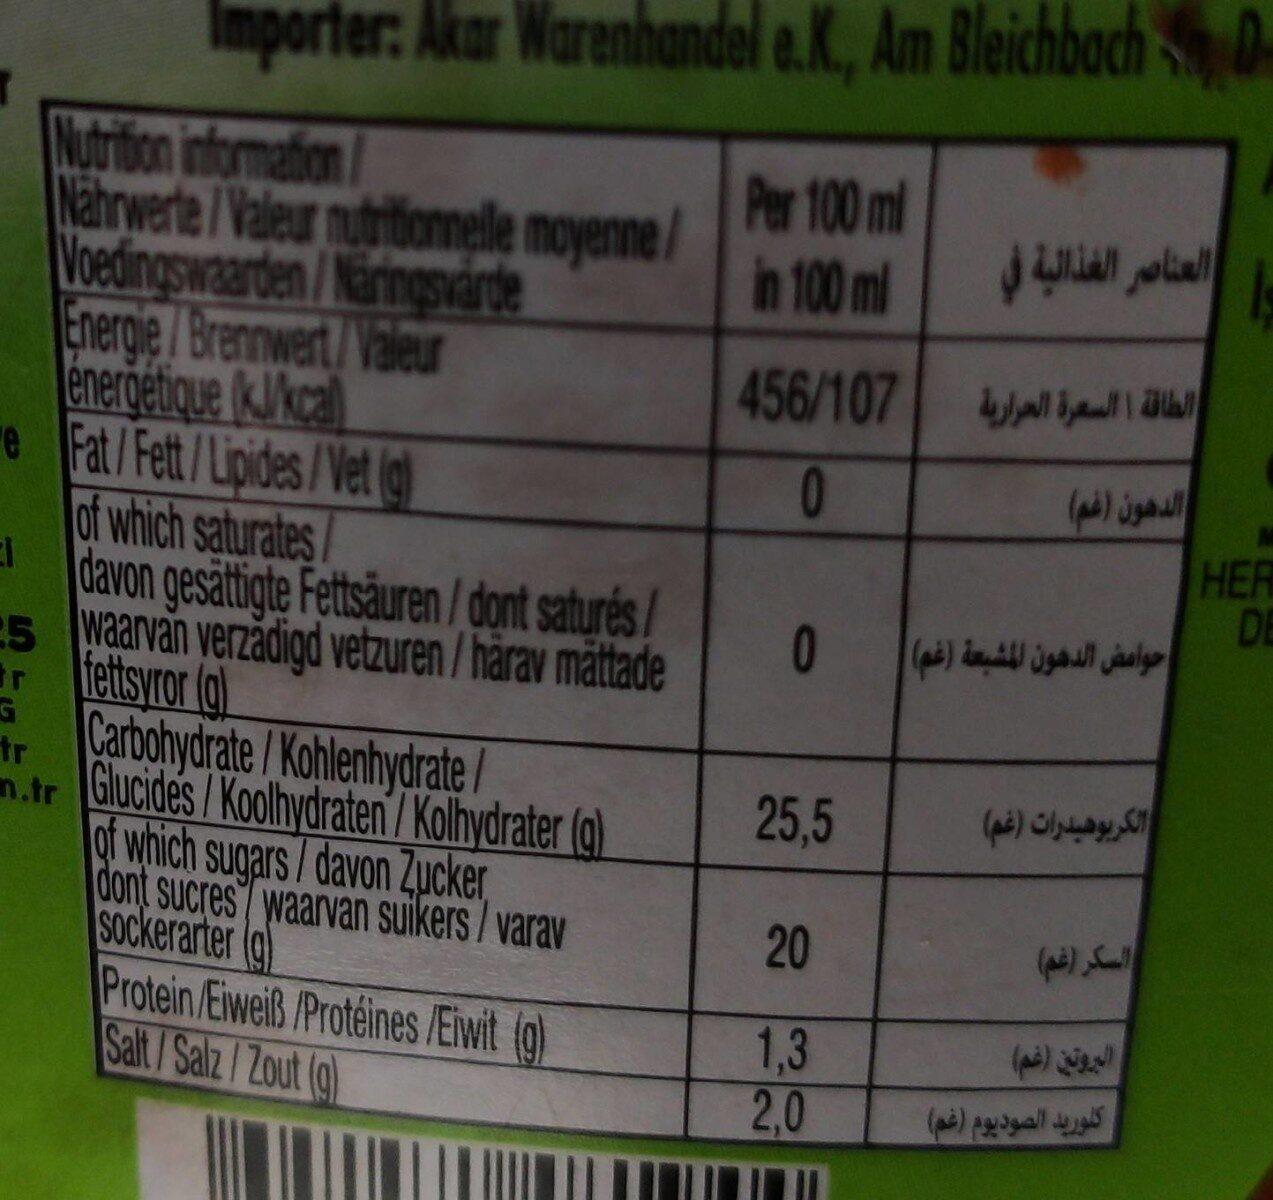 ülker Bizim Mutfak Ketchup - Informations nutritionnelles - fr